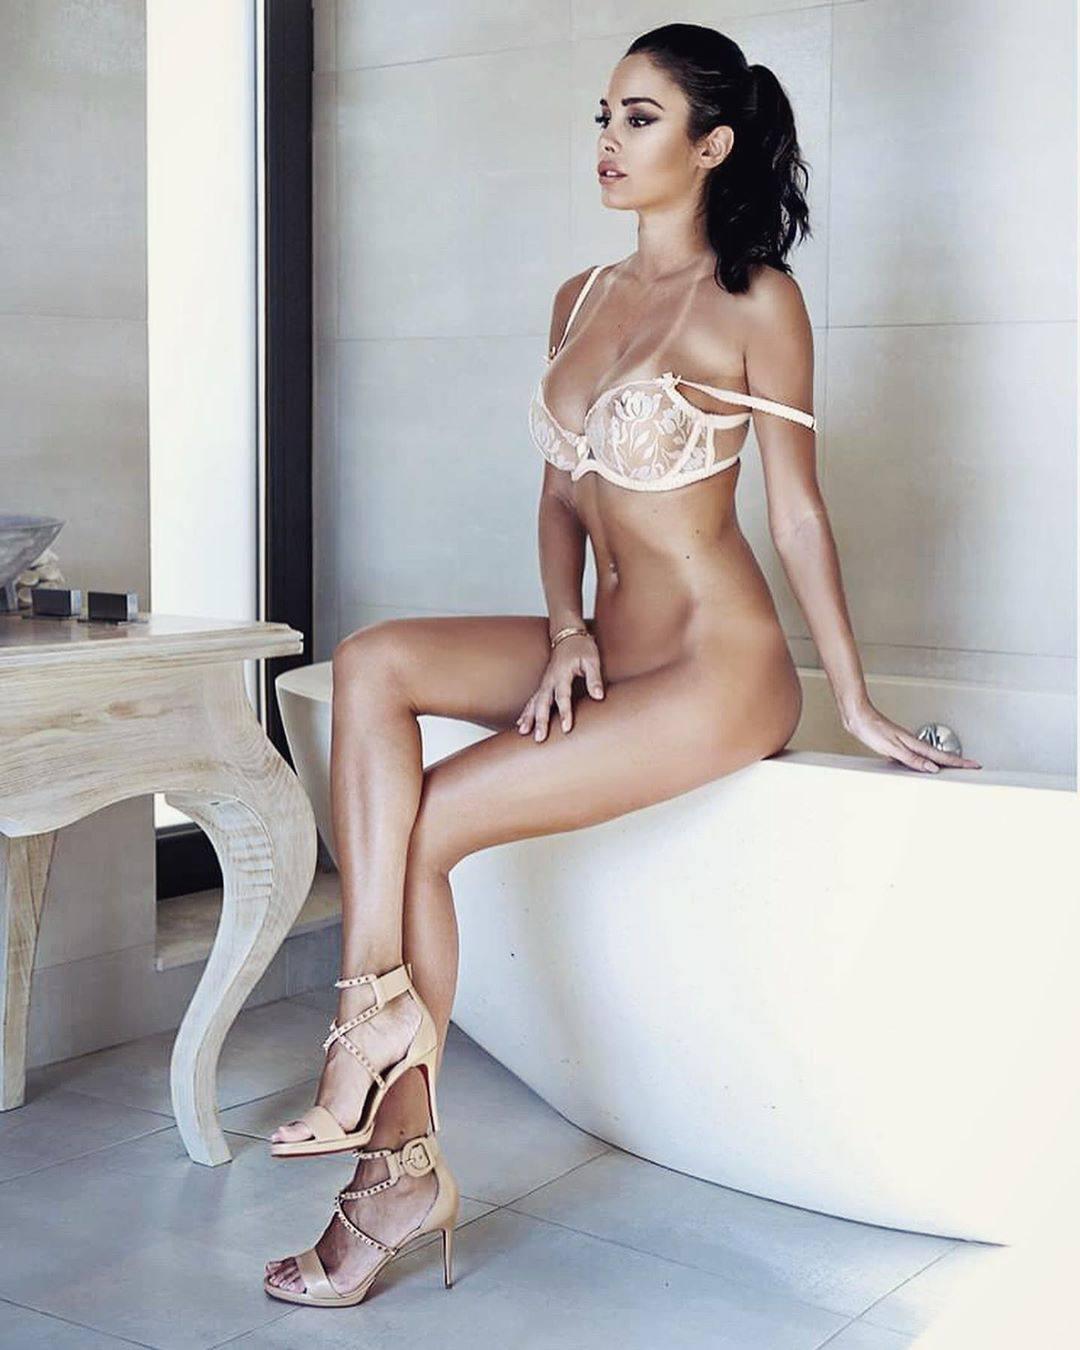 Susanna Canzian Hot Nude Photos